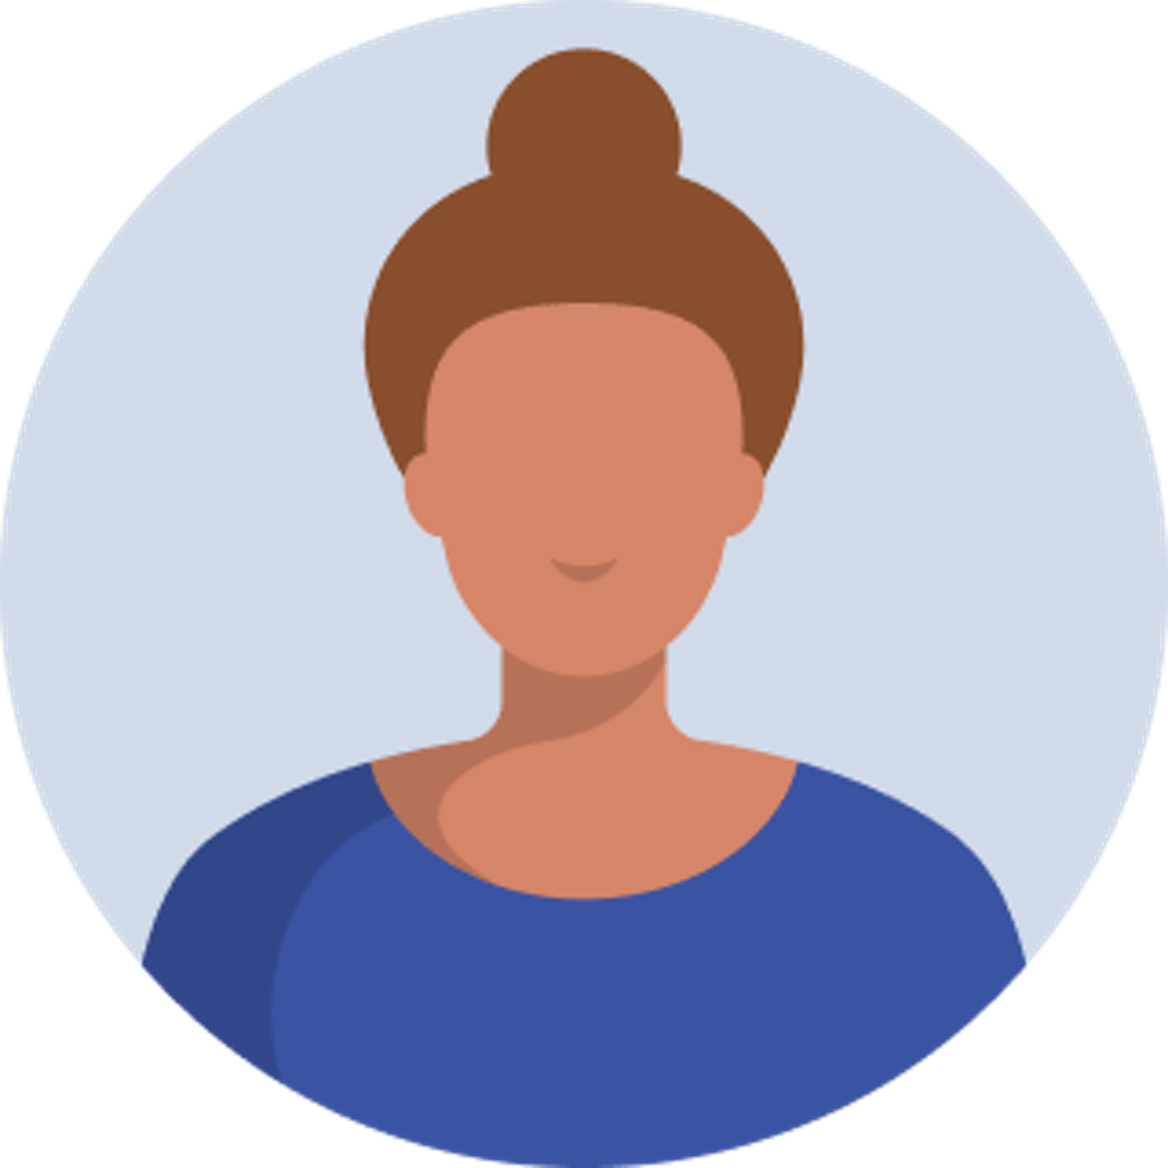 cartoon image of woman with their hair in a bun